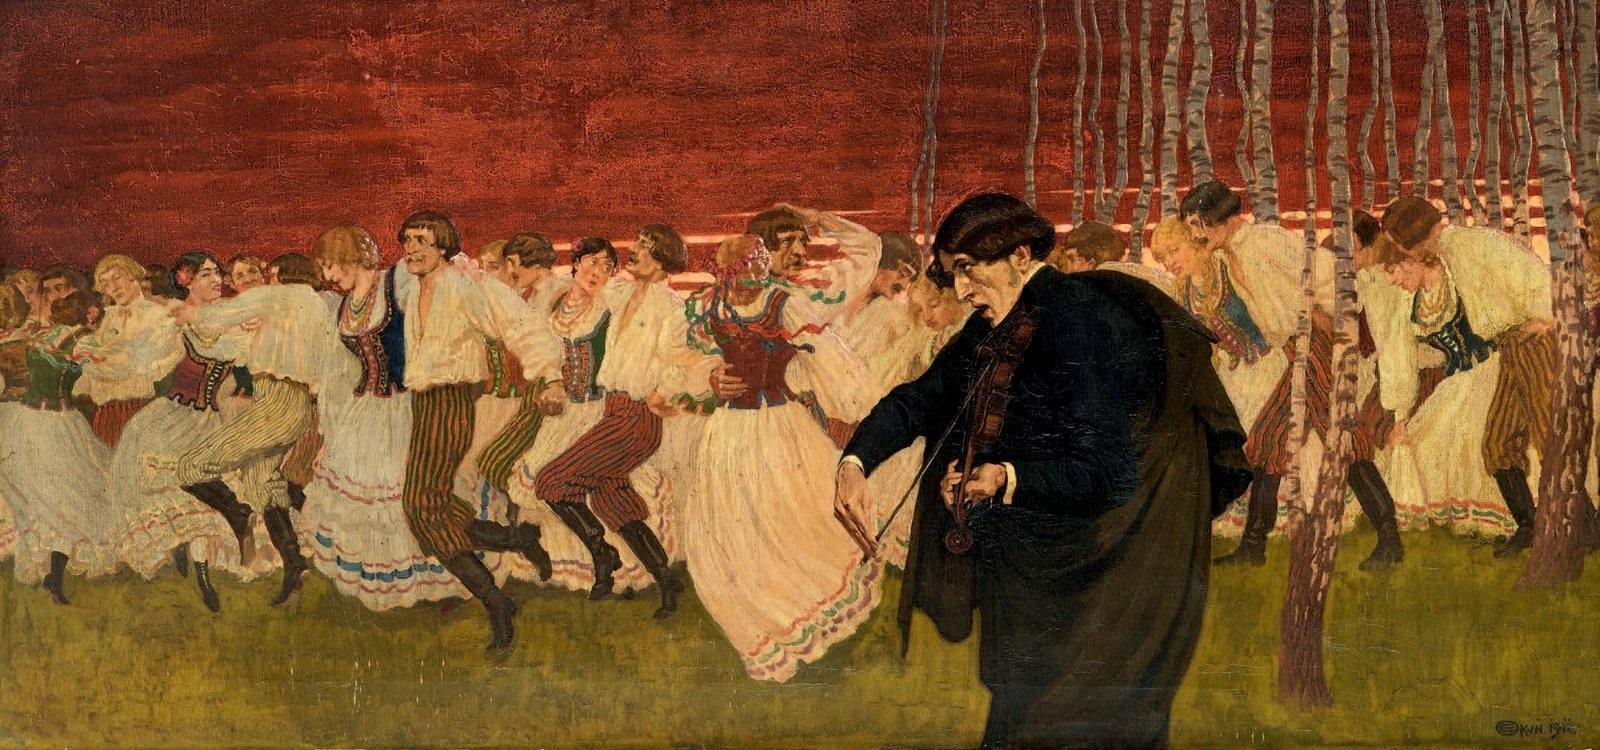 Edward_Okuń_-_Mazurka_de_Chopin_1911_CC